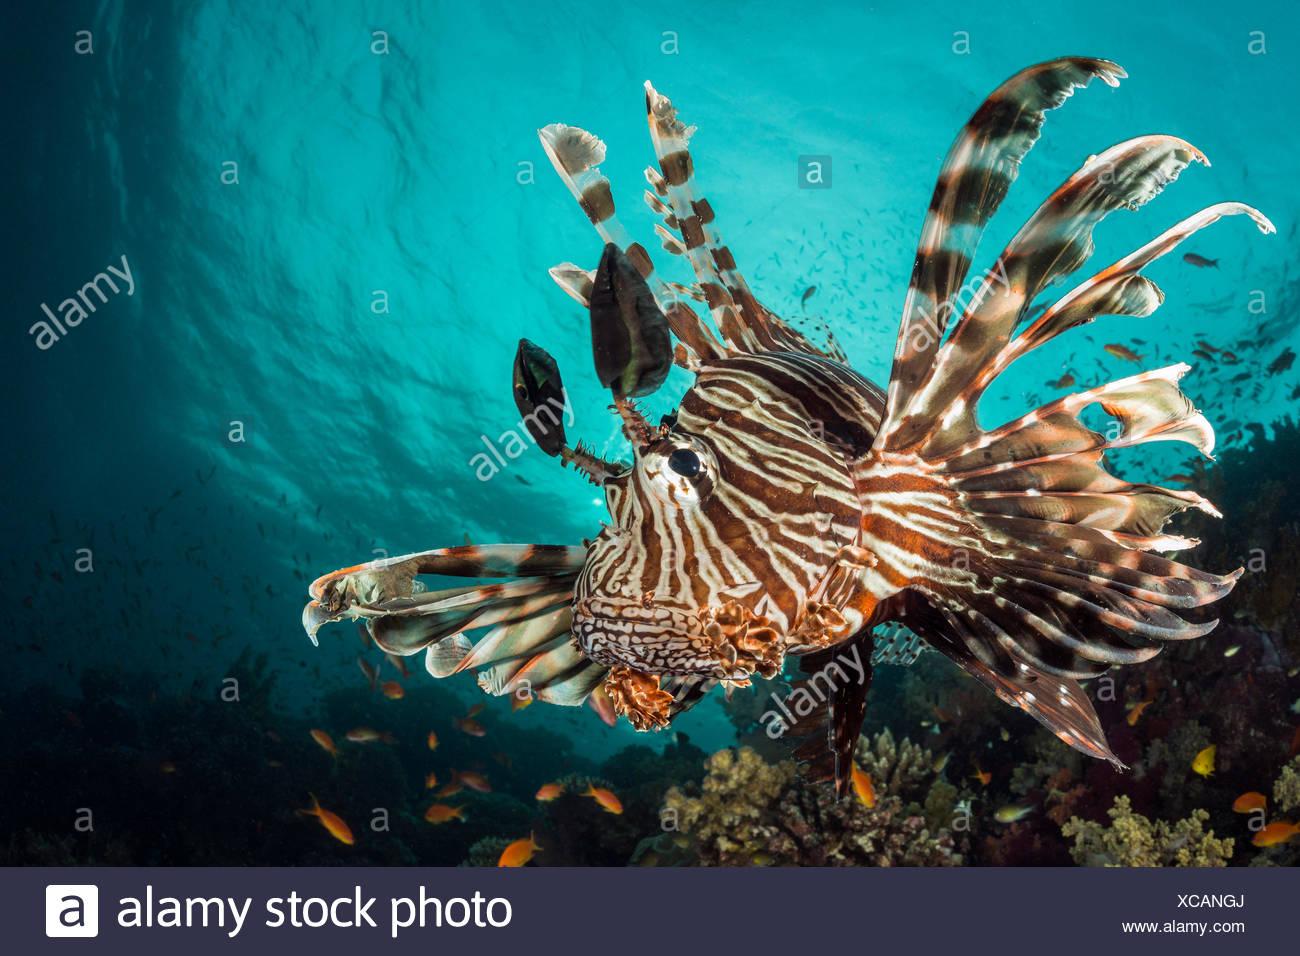 Common Lionfish, Pterois miles, Fury Shoal, Red Sea, Egypt - Stock Image